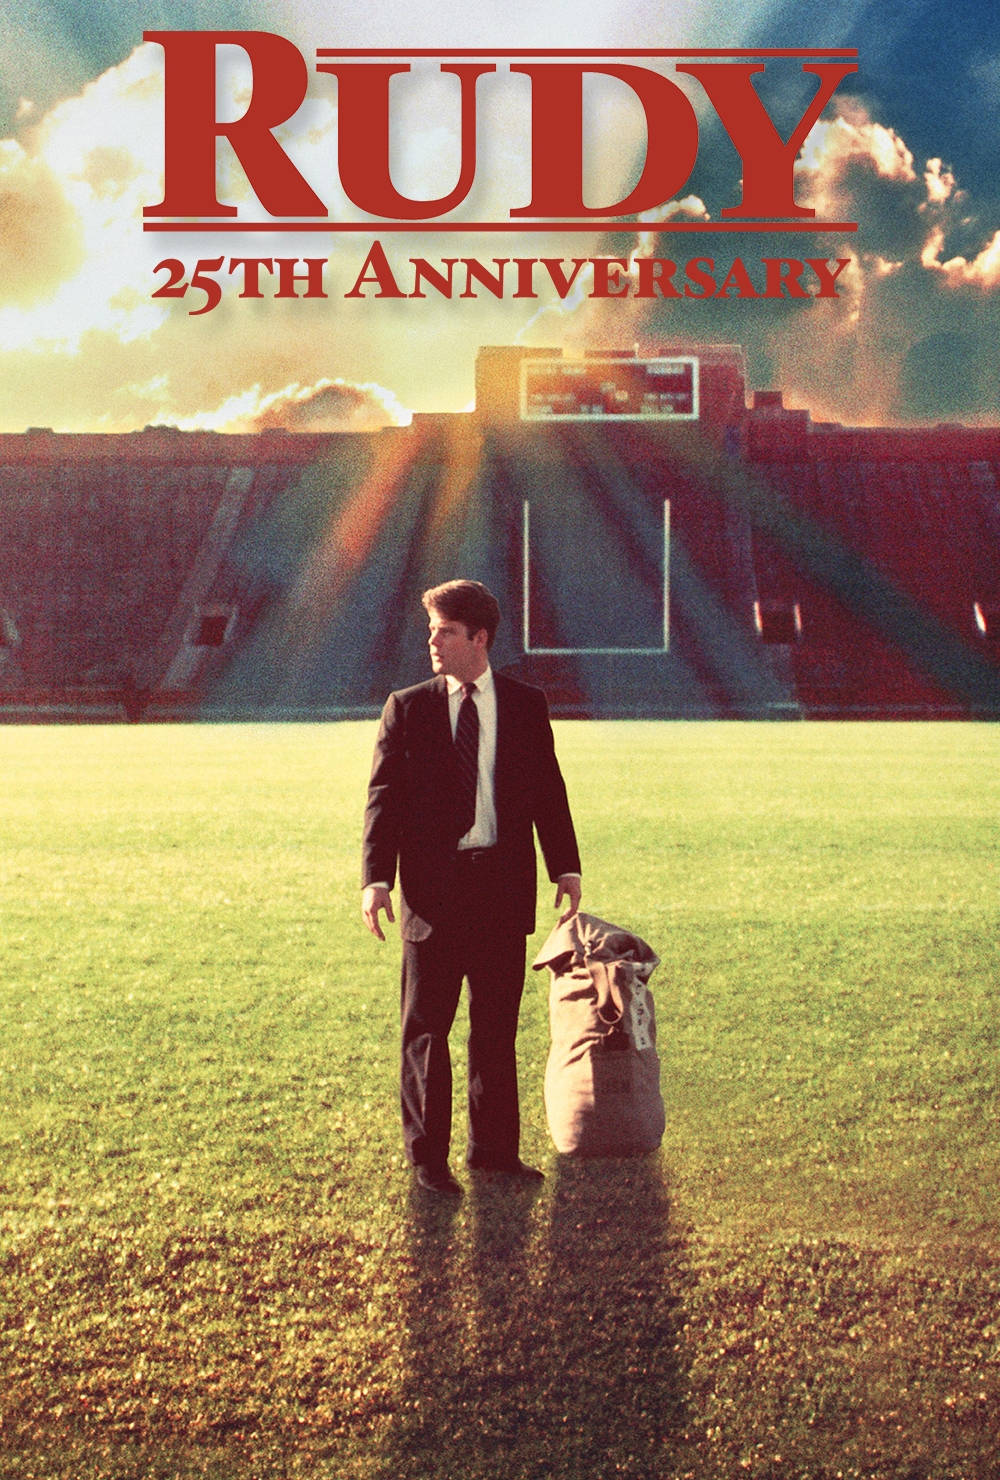 Rudy 25Th Anniversary